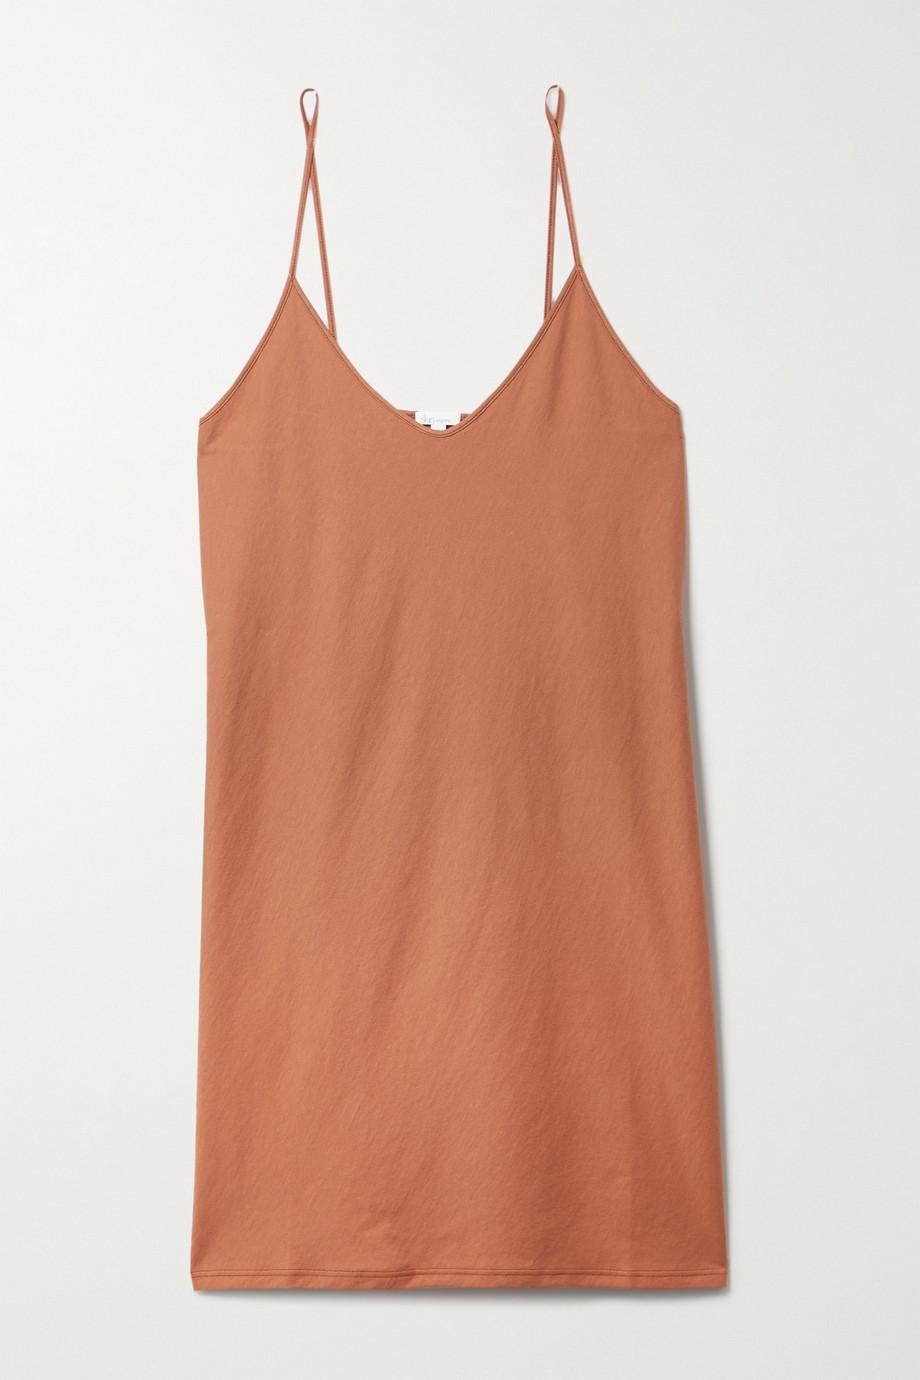 Skin + NET SUSTAIN organic Pima cotton-jersey nightdress